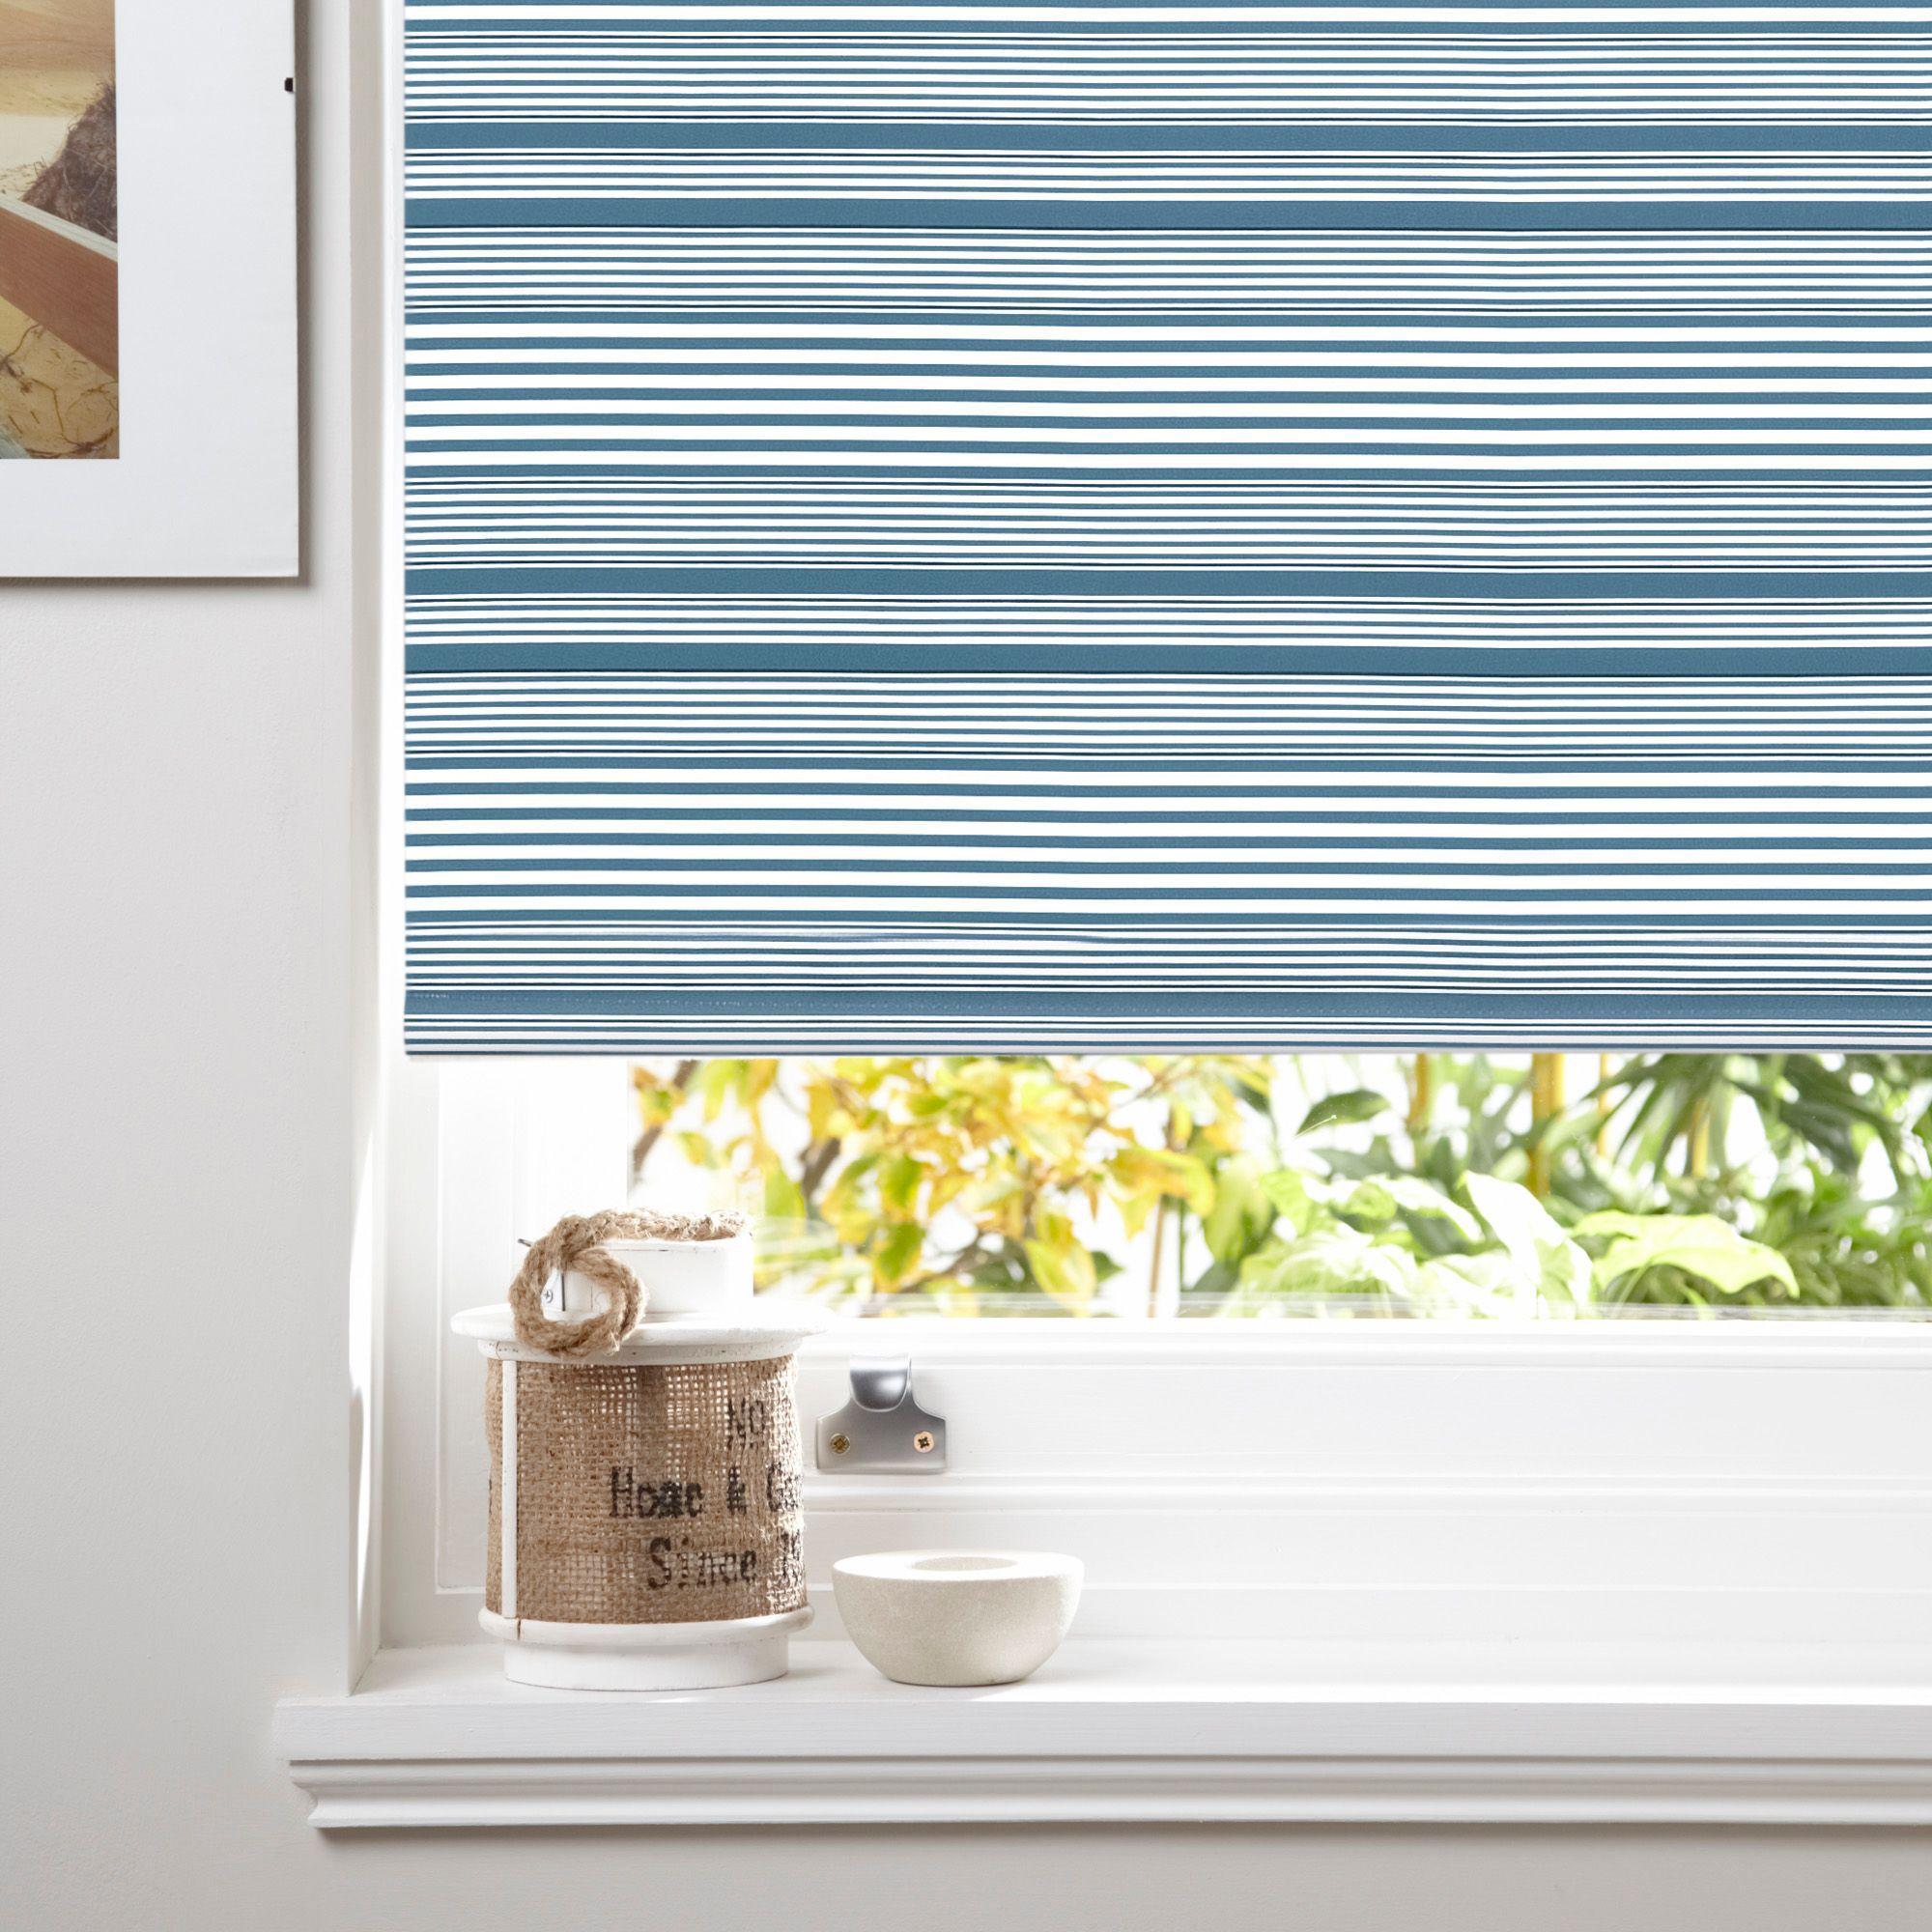 Bathroom Window Blinds B&Q colours benedita corded blue blackout roller blind (l)160 cm (w